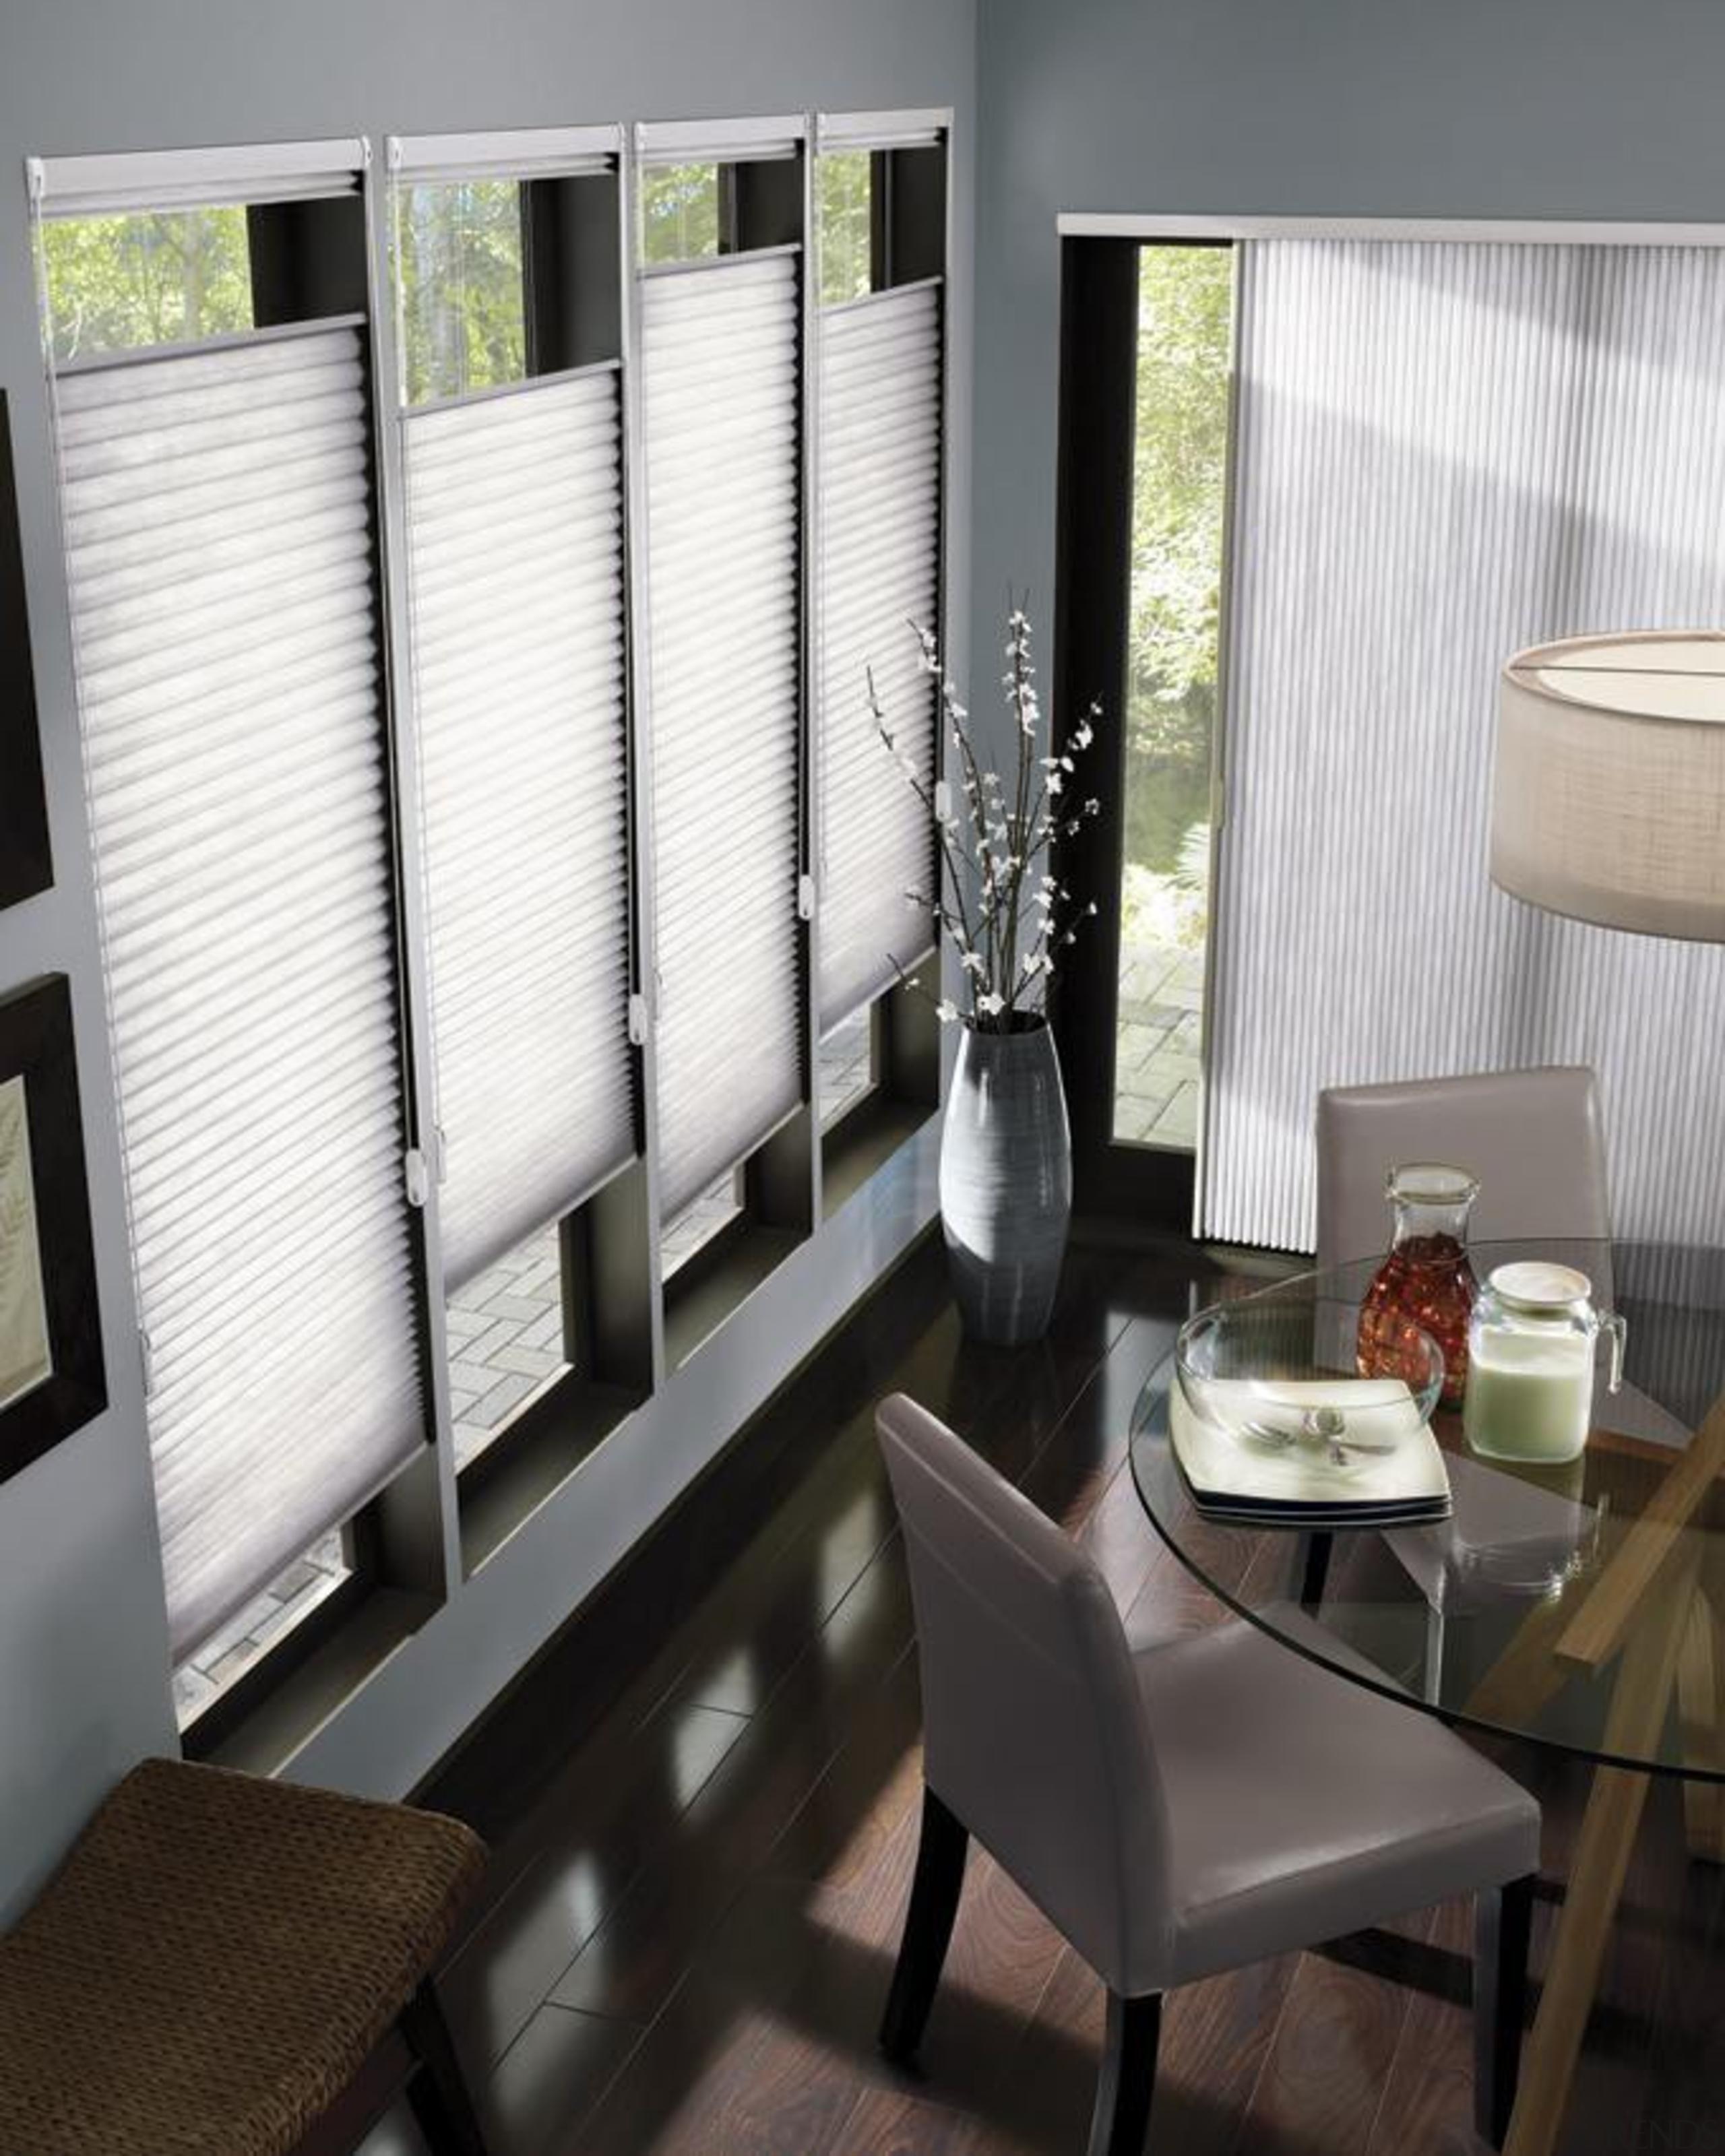 luxaflex duette shades - luxaflex duette shades - curtain, dining room, interior design, living room, room, shade, window, window blind, window covering, window treatment, white, black, gray